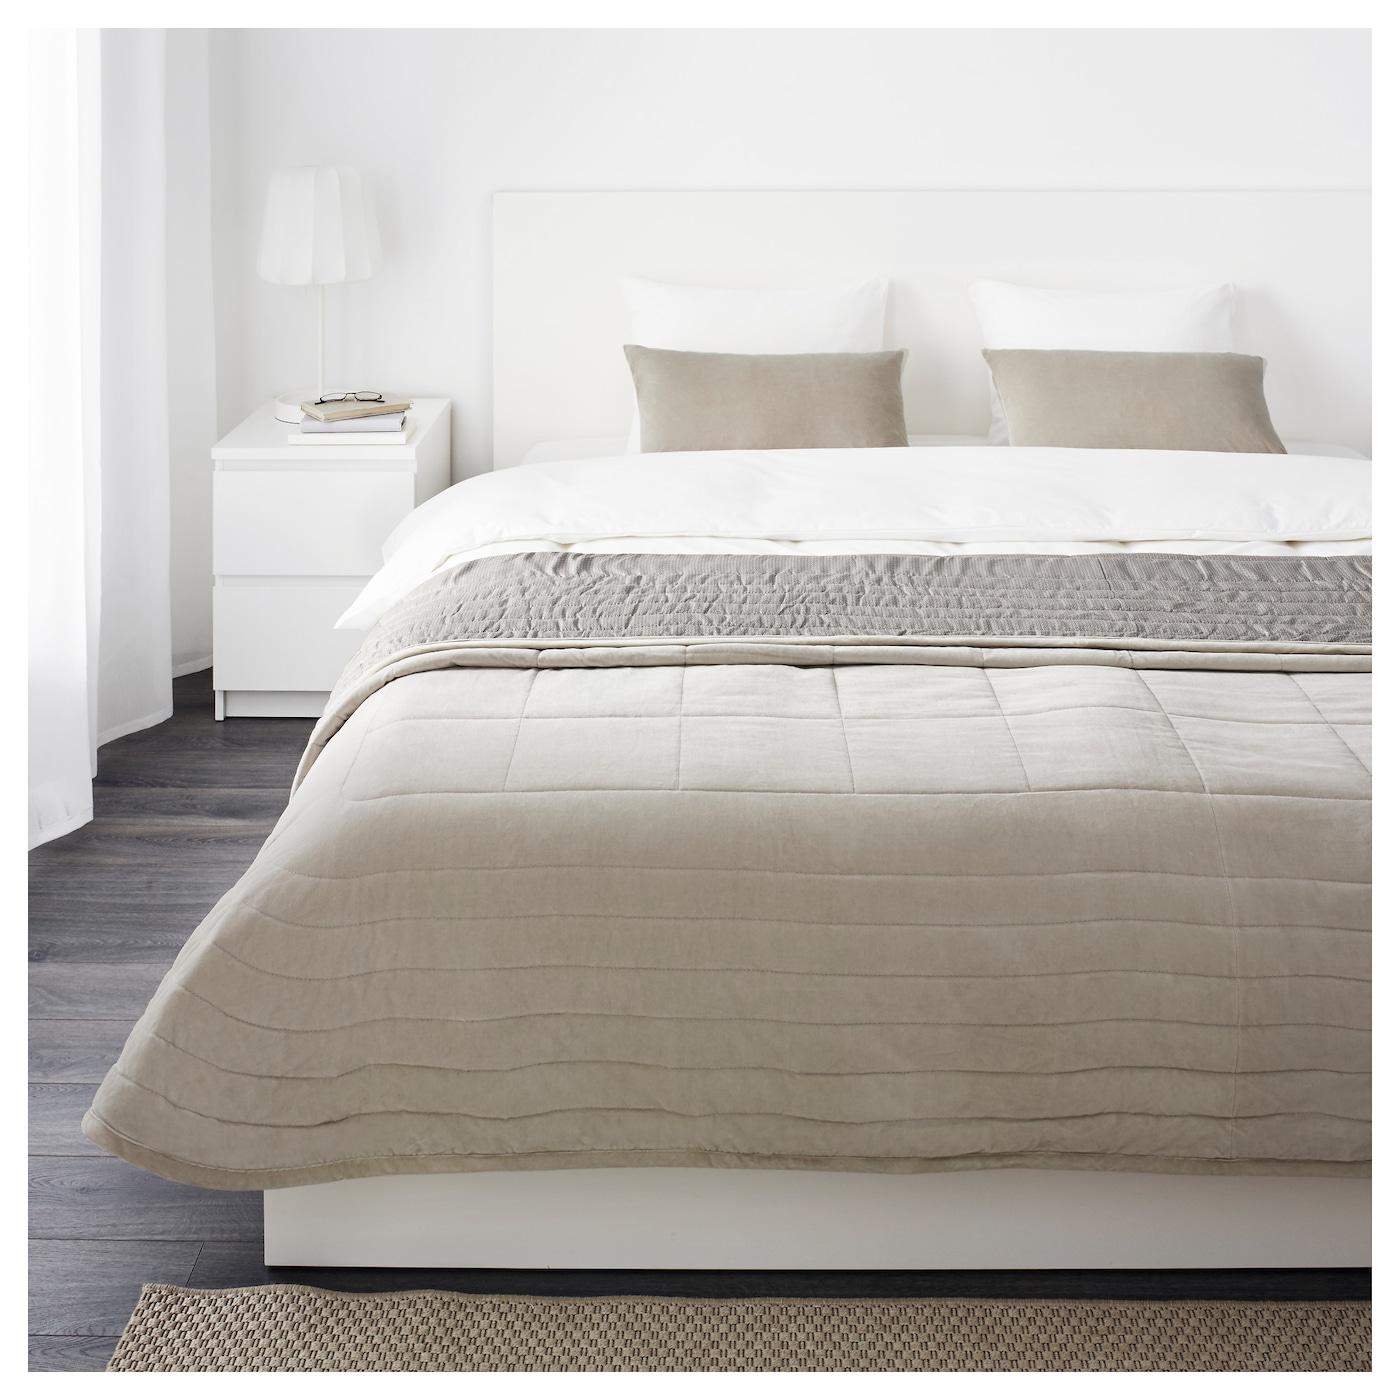 PENNINGBLAD Bedspread and 2 cushion covers Grey 260x280 40x65 cm